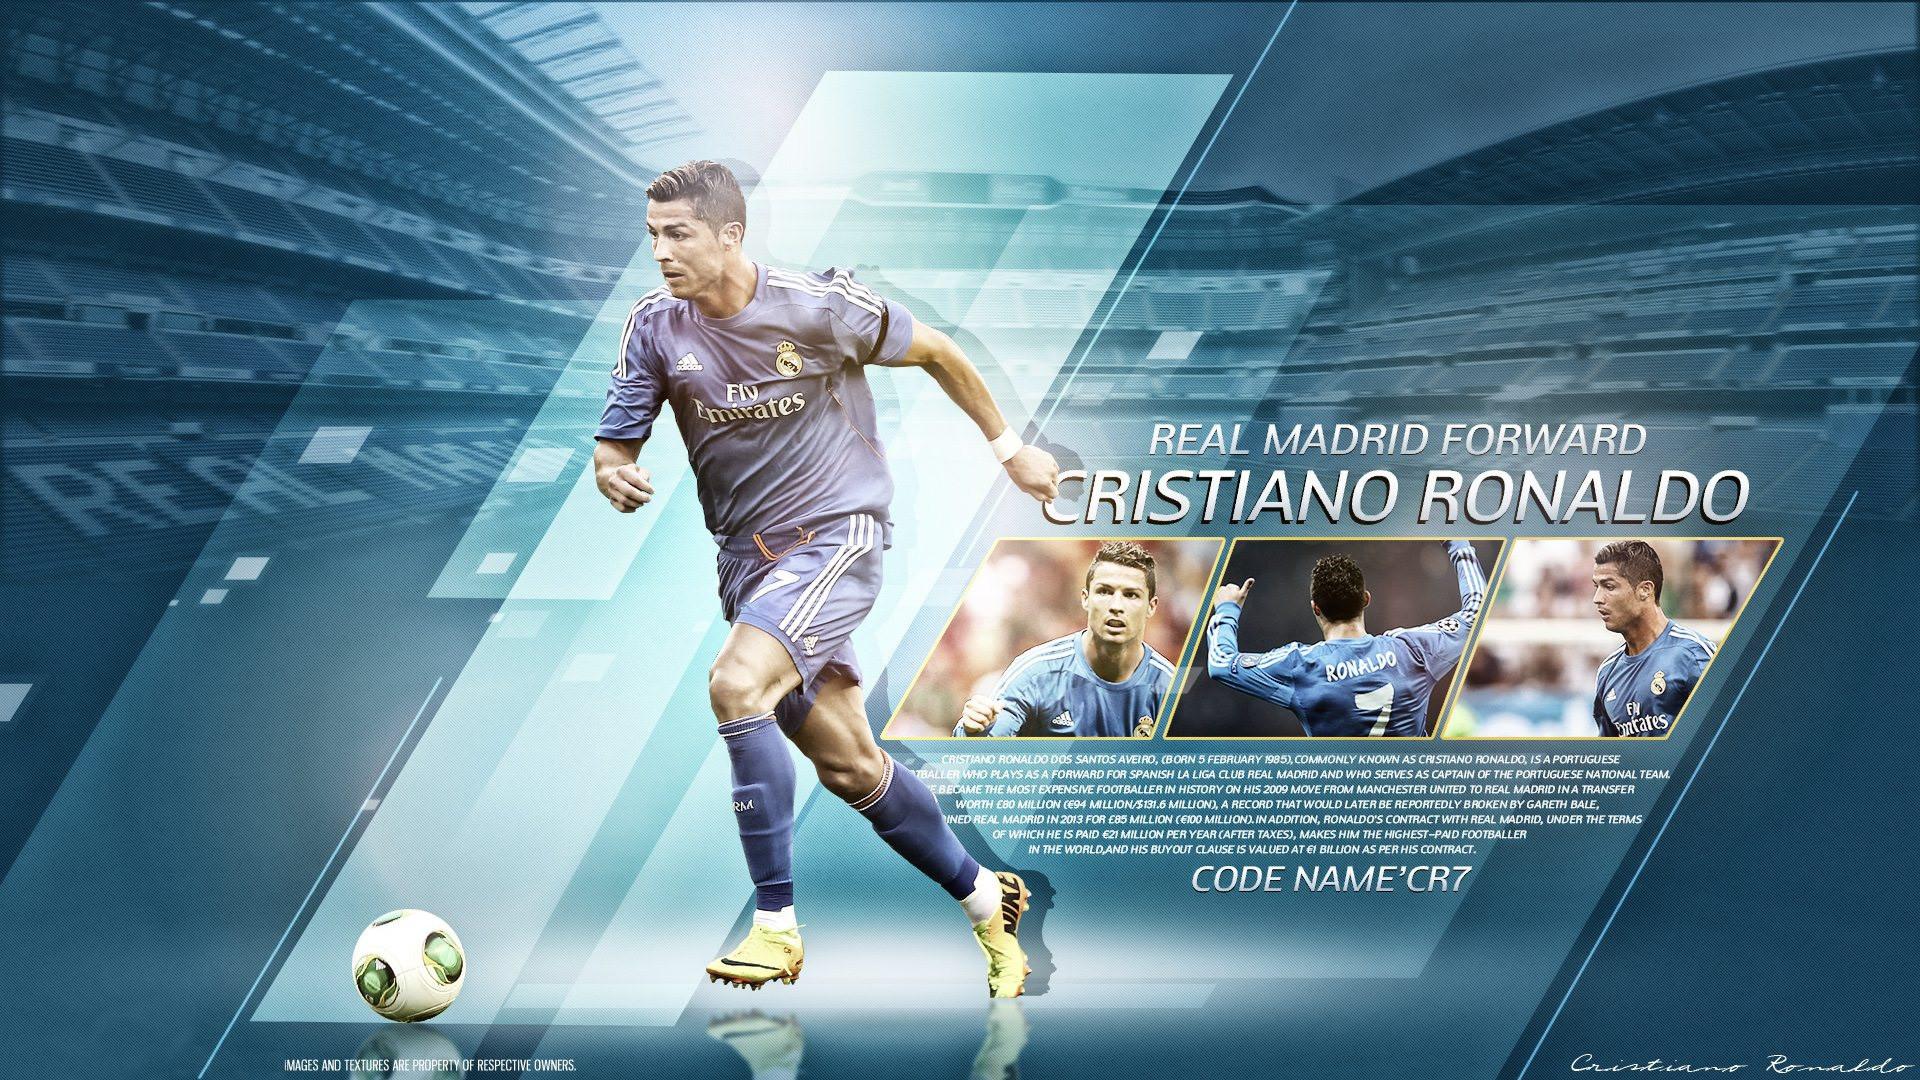 Cristiano Ronaldo Real Madrid wallpaper